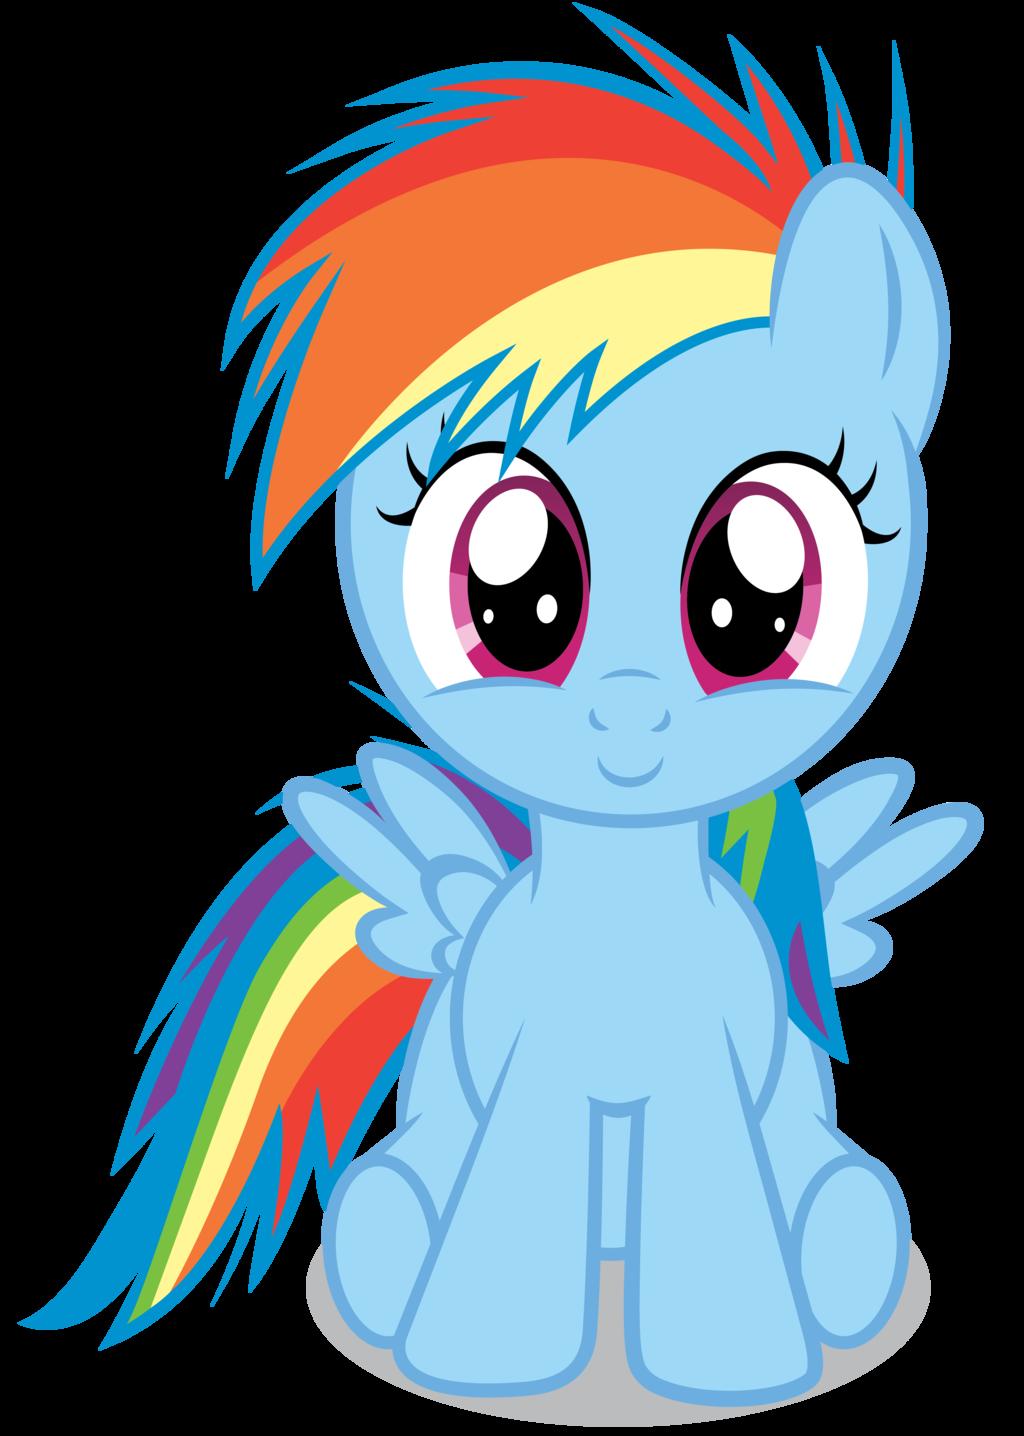 [Image - 419002] | My Little Pony: Friendship is Magic ...